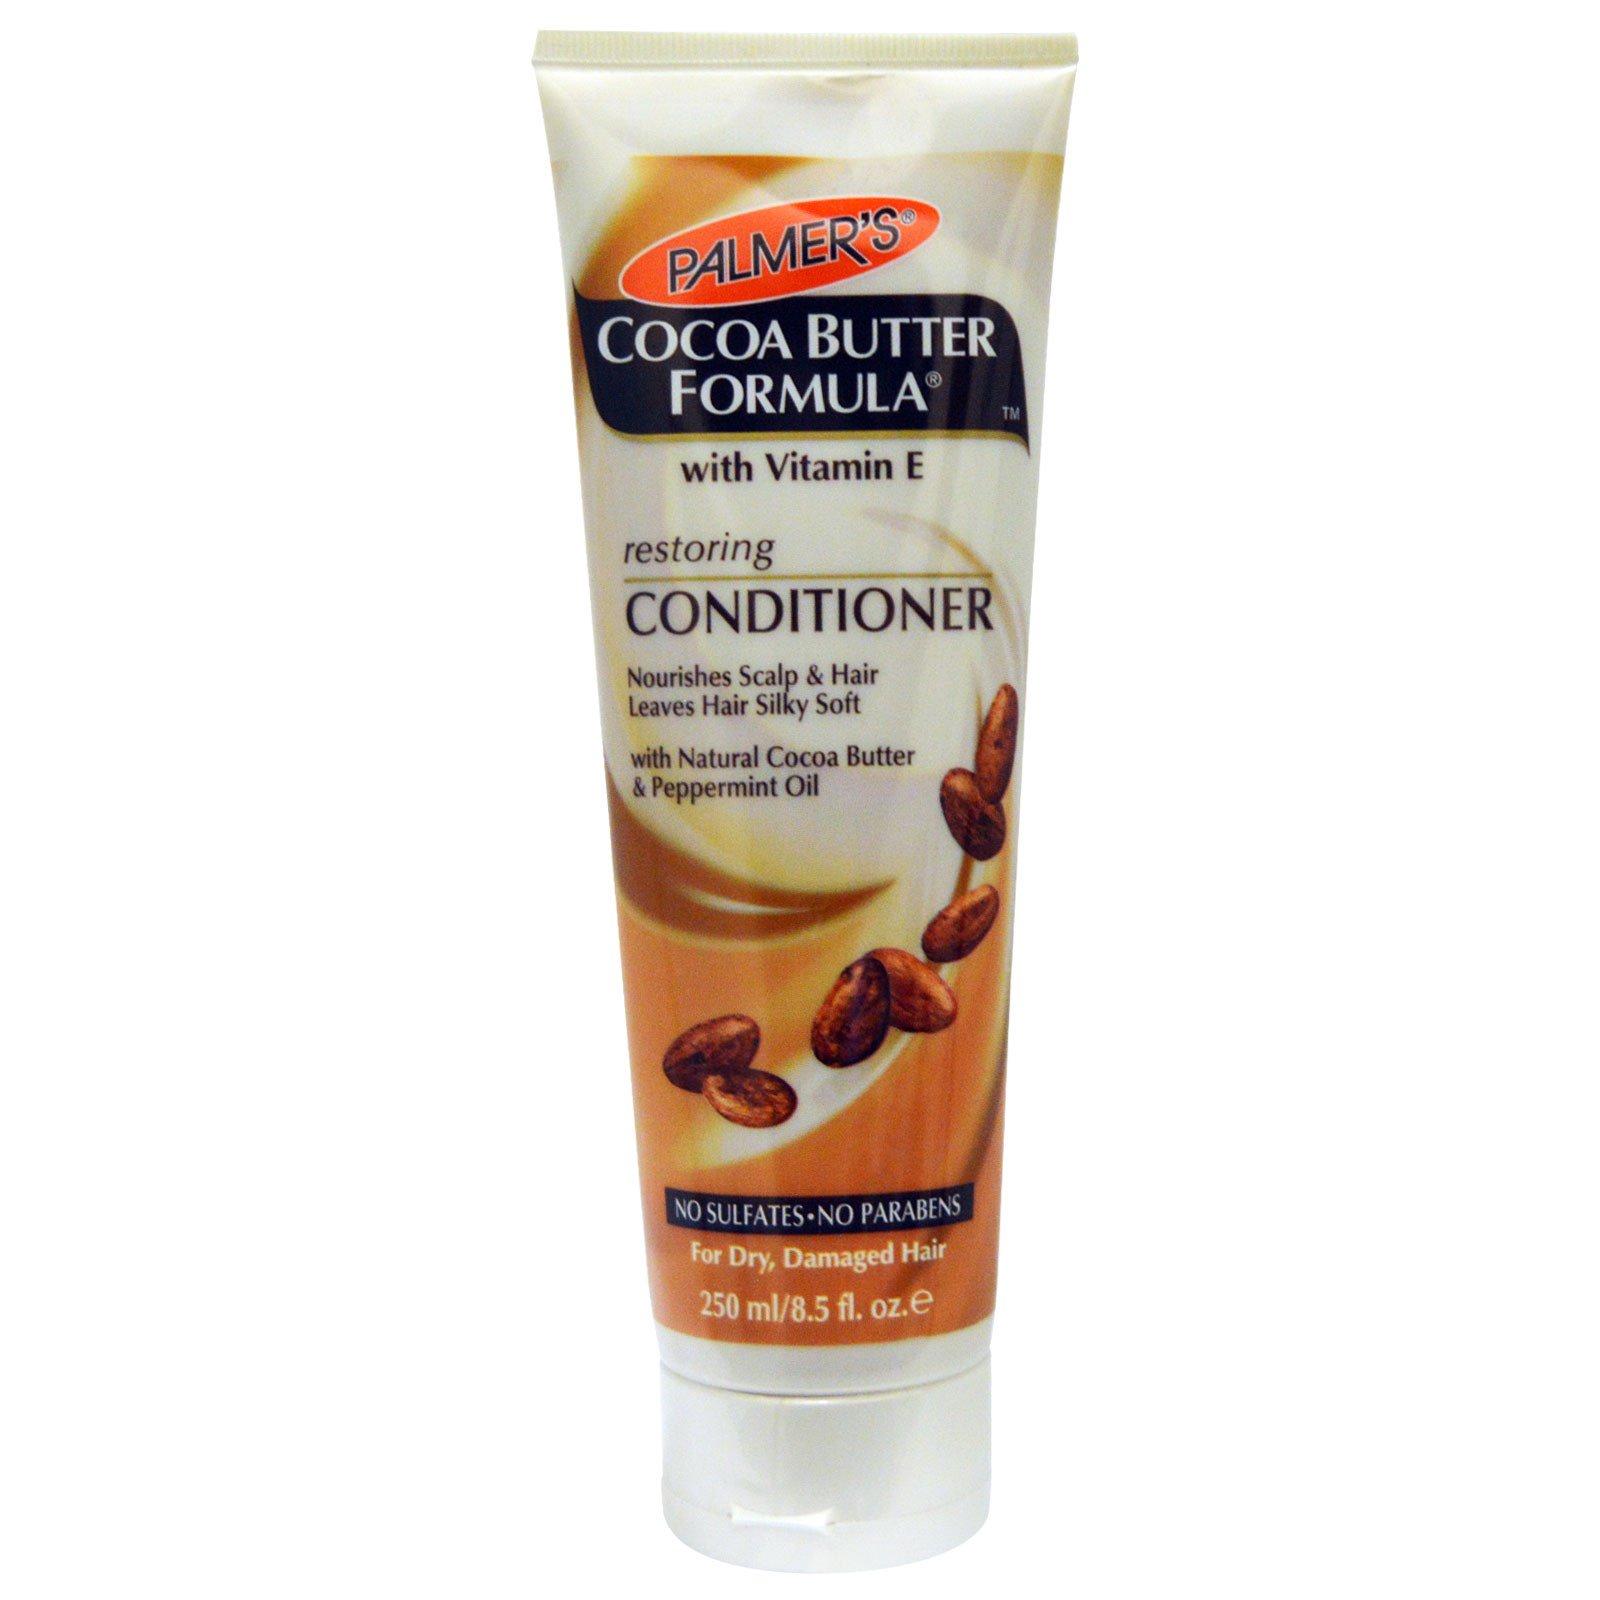 Palmer's, Формула какао-масла, восстанавливающий кондиционер, 250 мл (8,5 жидких унций)